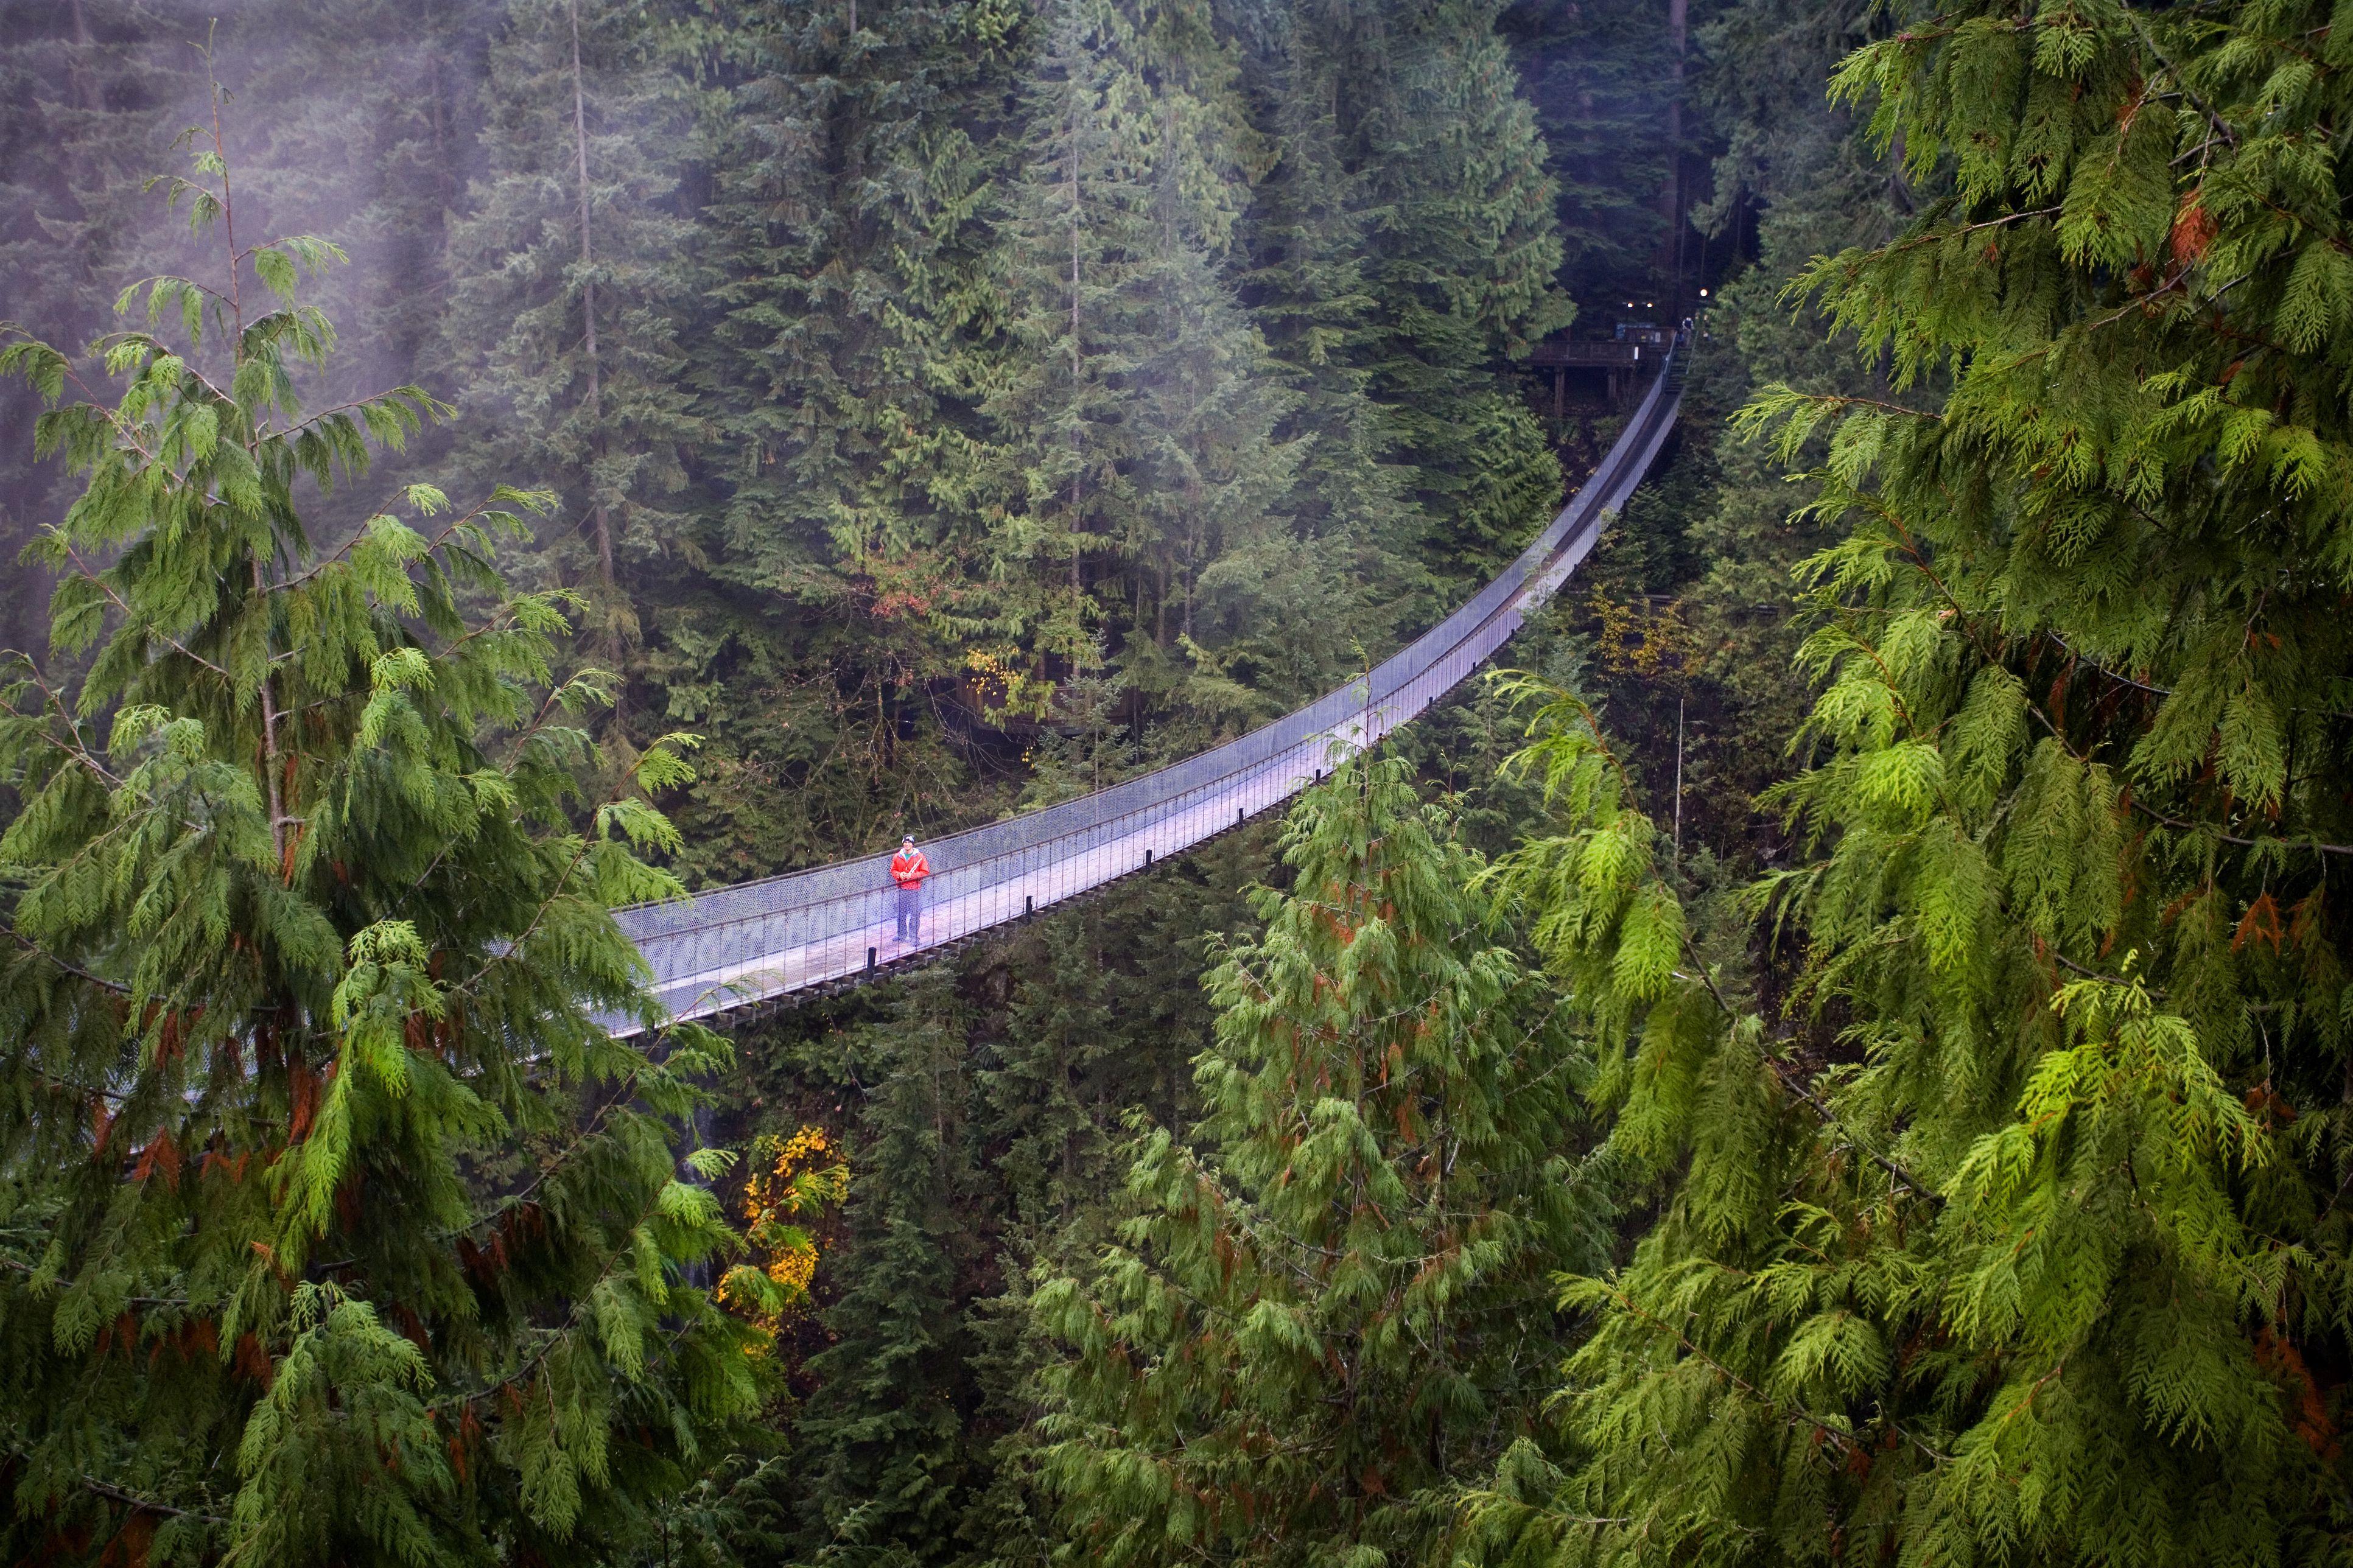 Capilano Suspension Bridge near Vancouver, B.C.